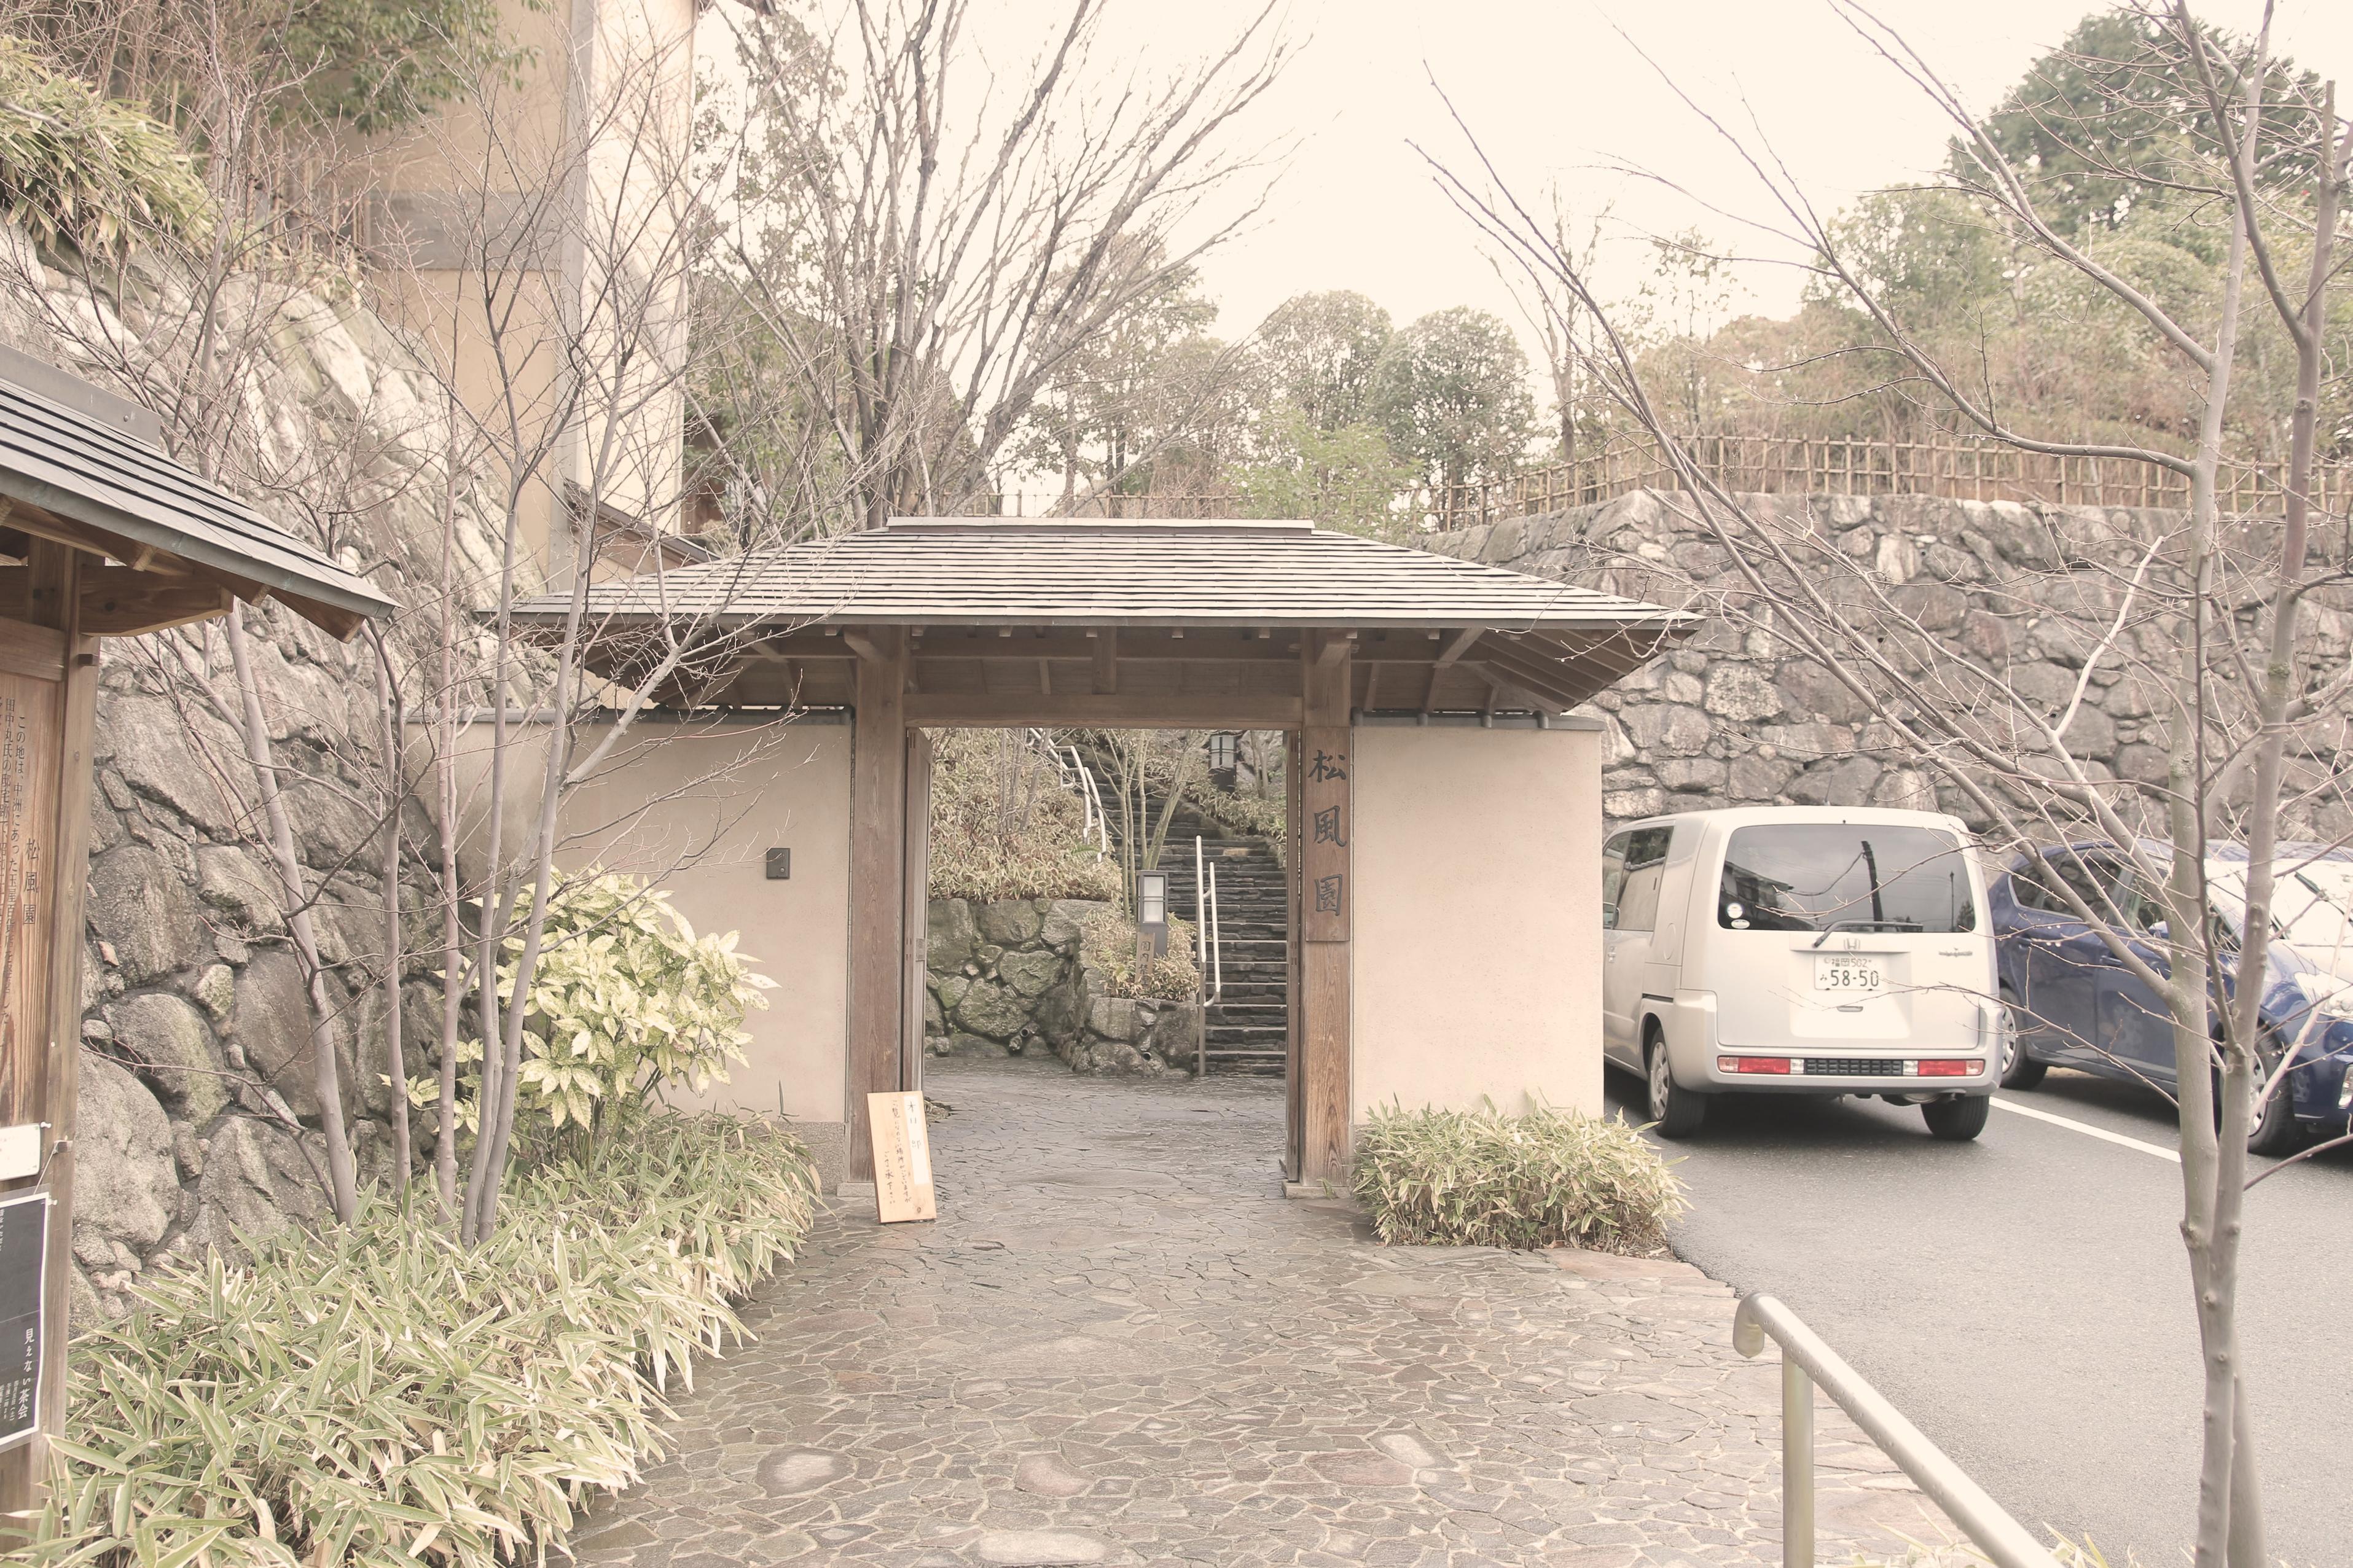 福岡市平尾の茶室 松風園 福岡 国際交流 Whats Fukuoka